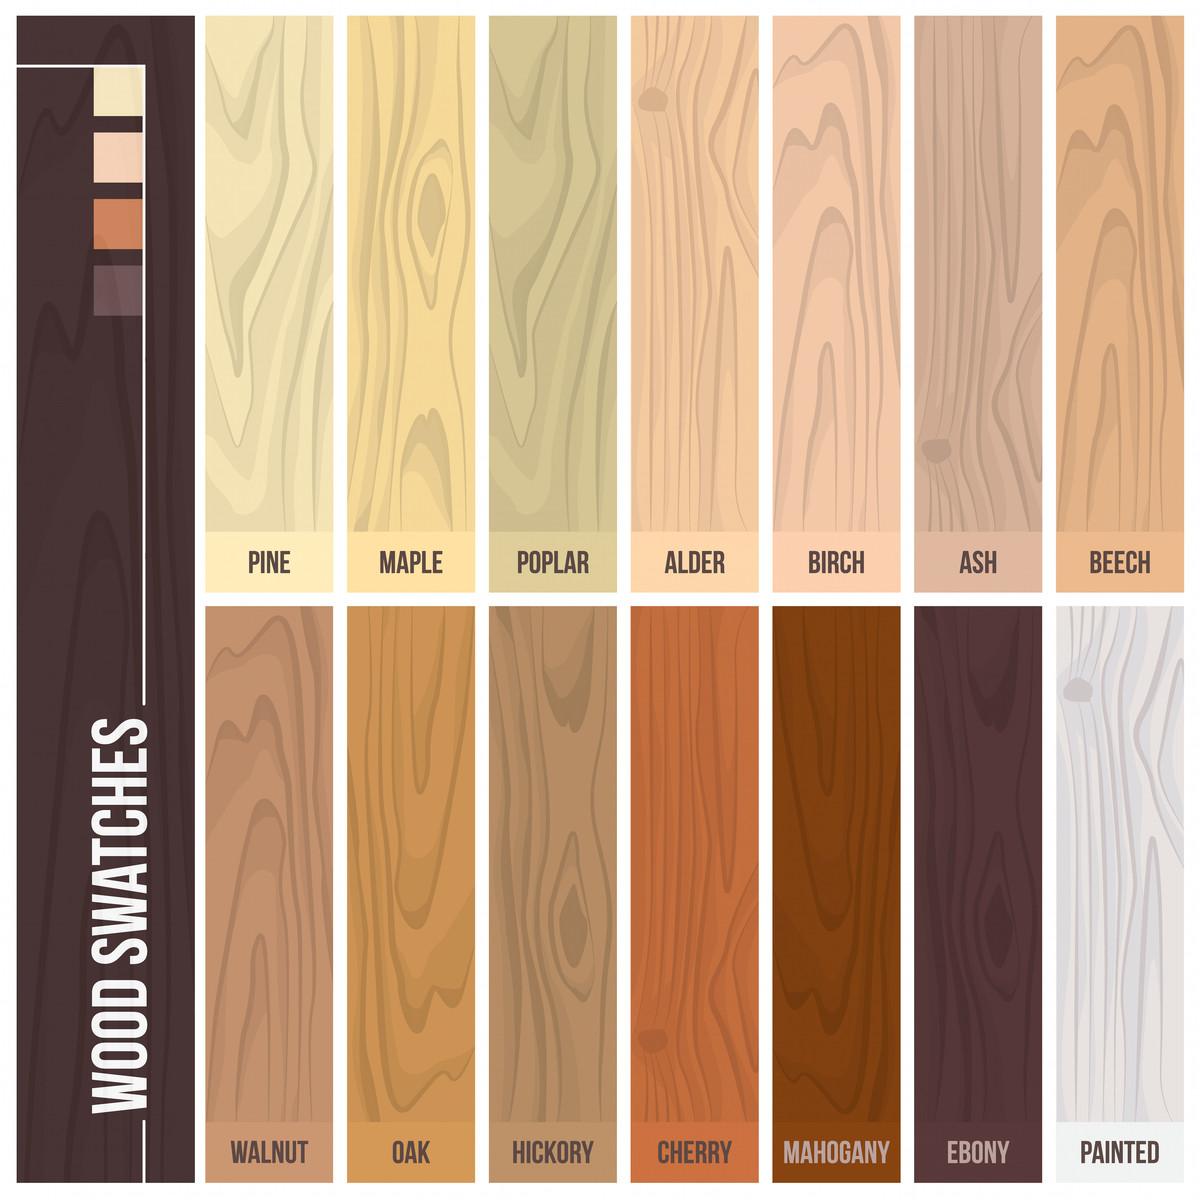 best hardwood floors for small spaces of 12 types of hardwood flooring species styles edging dimensions in types of hardwood flooring illustrated guide